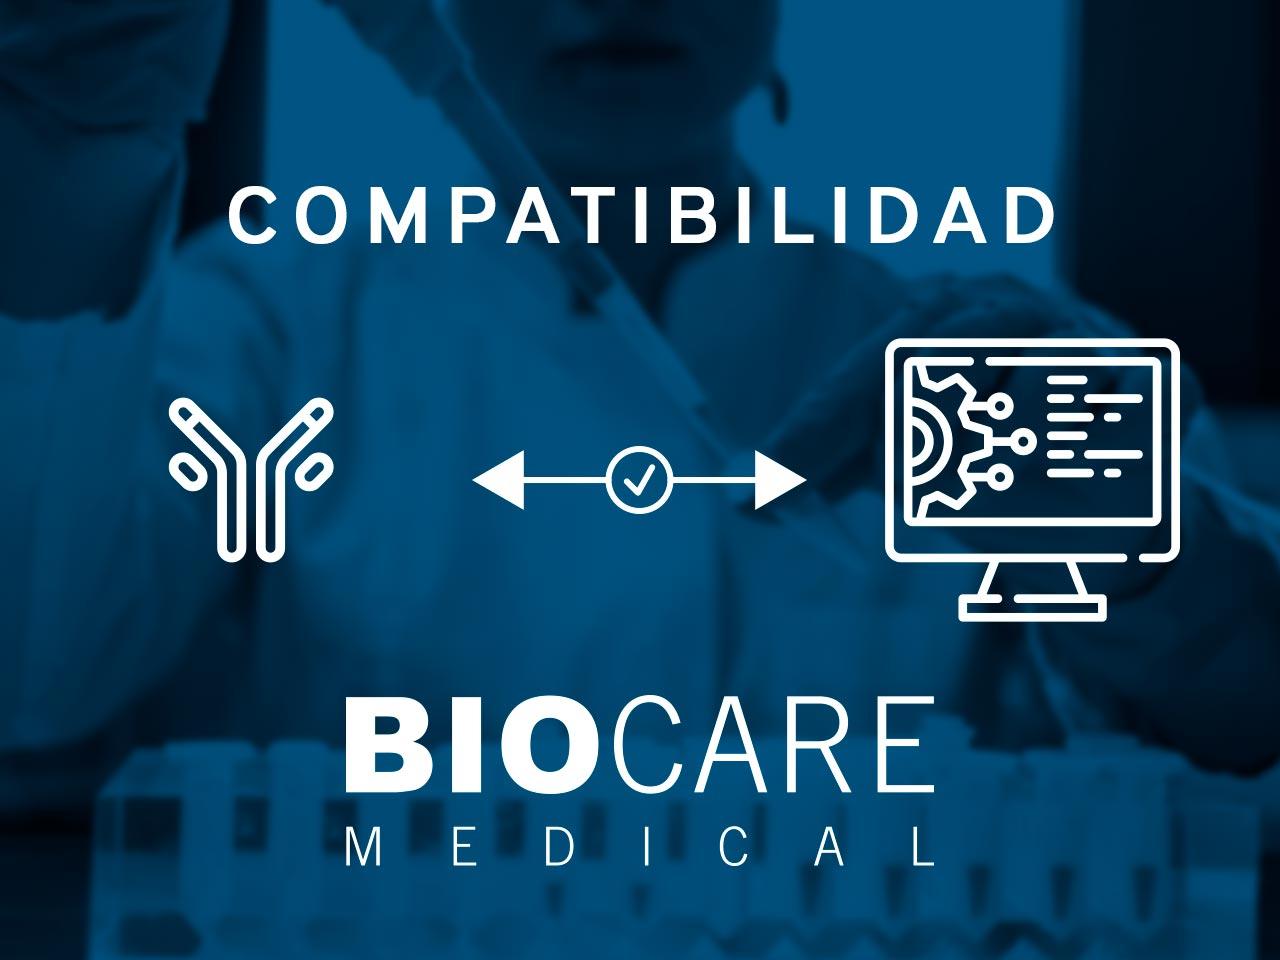 Compatibilidad Biocare